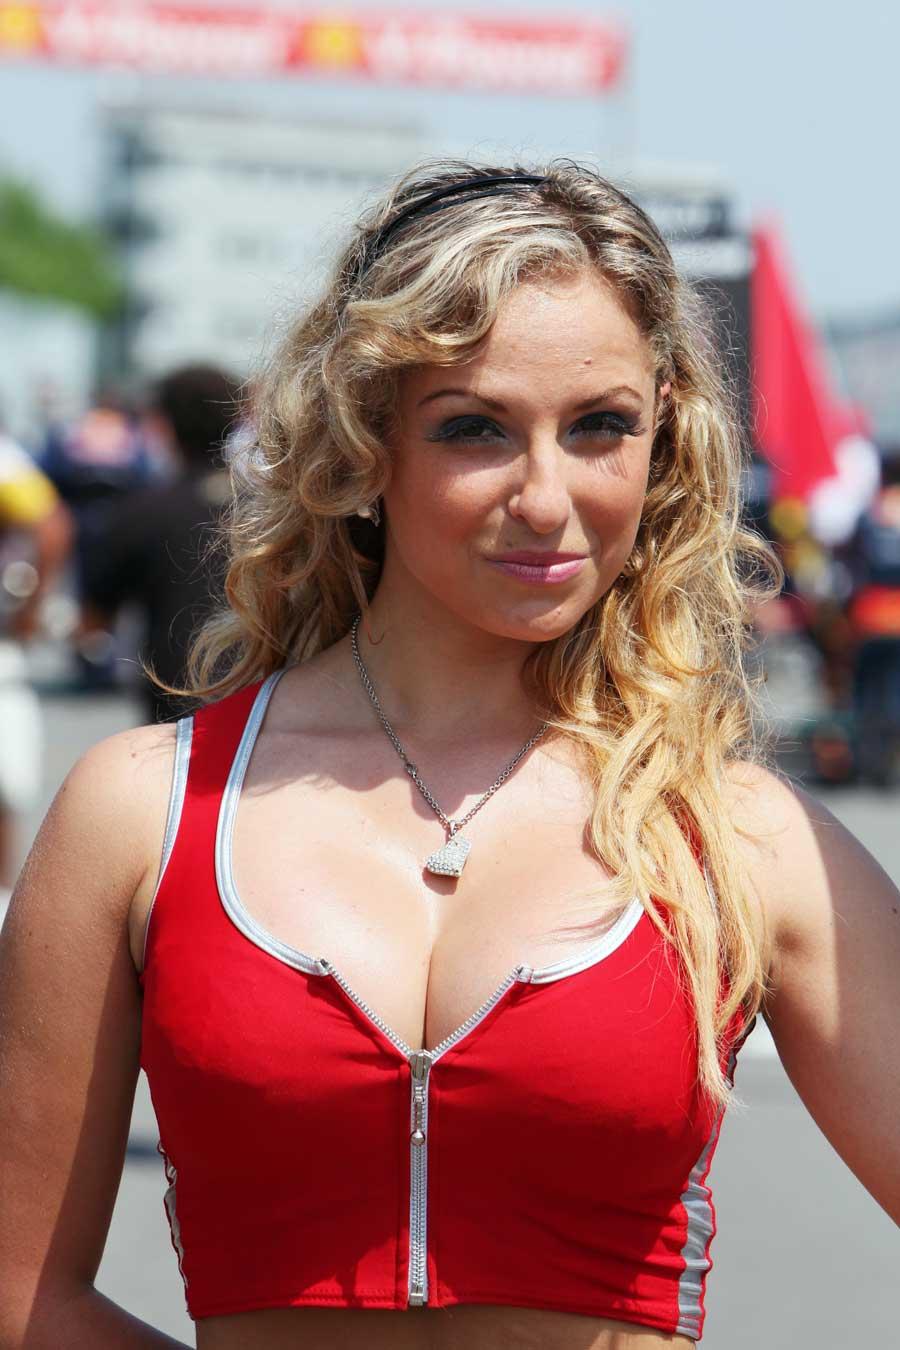 grid girl poses on race day formula 1 photos espn co uk